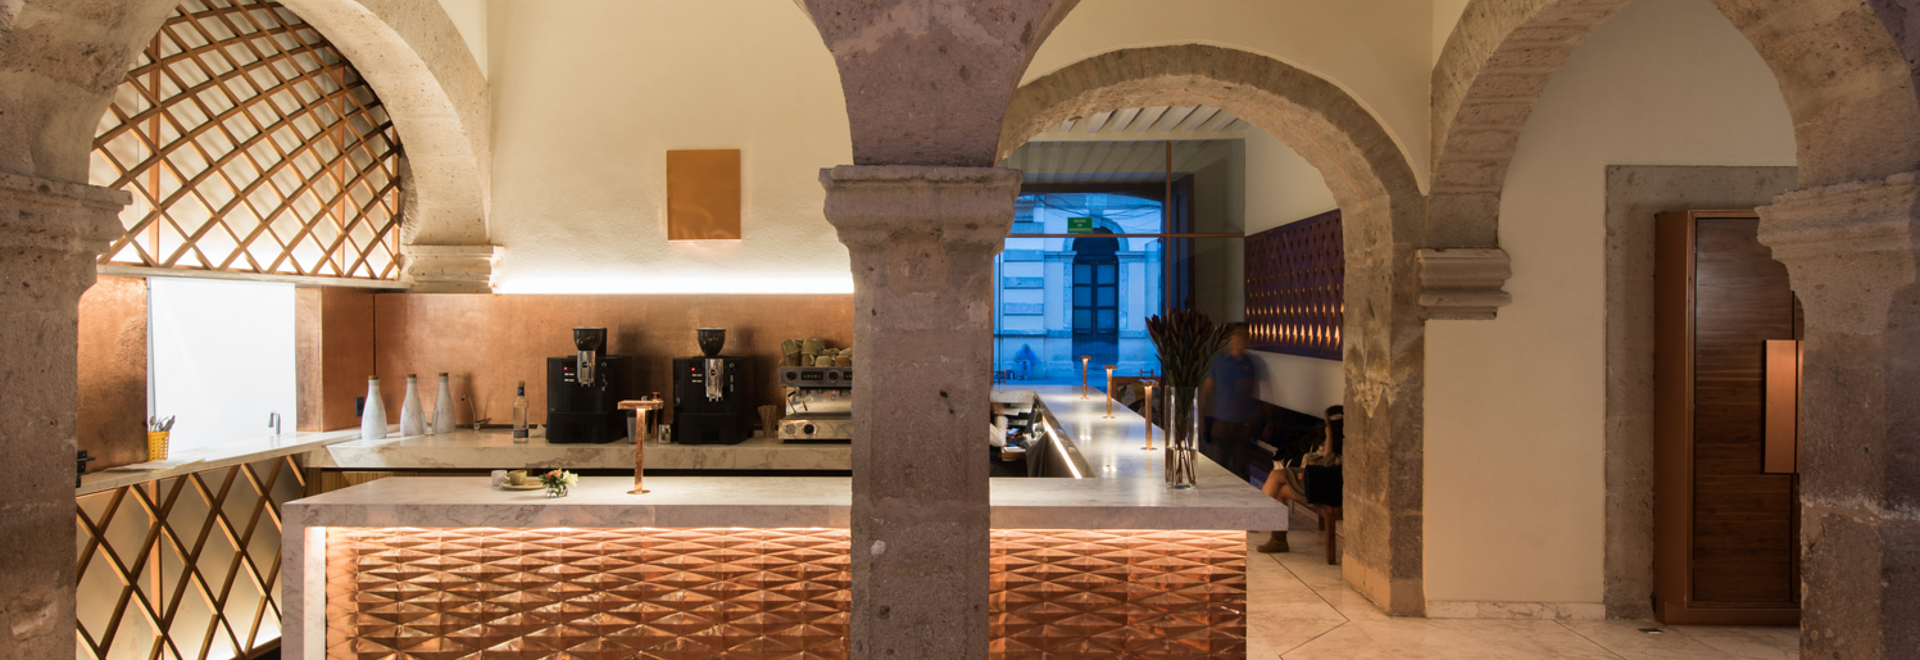 Herencia Hotel / BUDIC